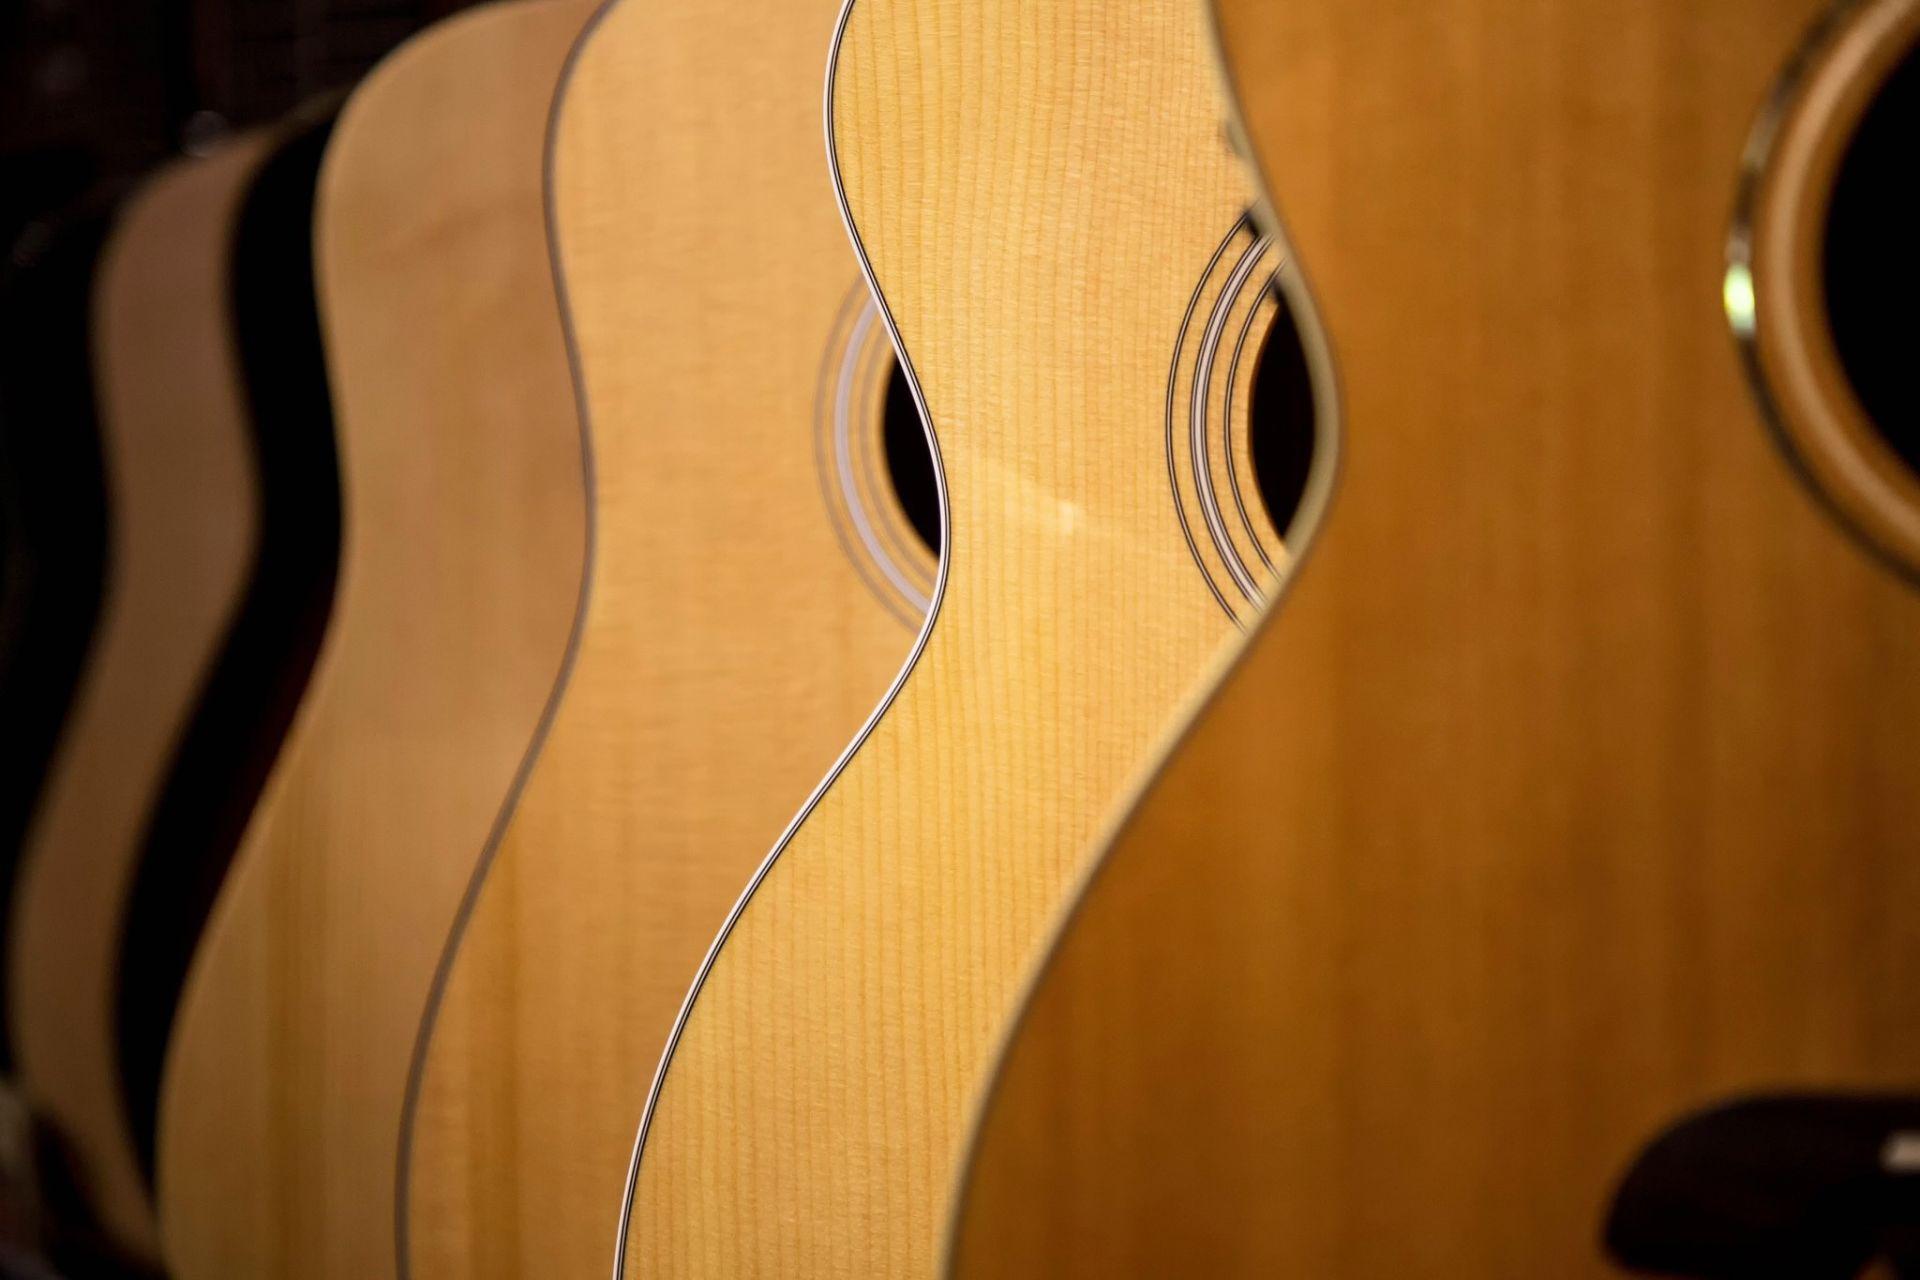 Acoustic Guitars wood, HD Desktop Wallpaper